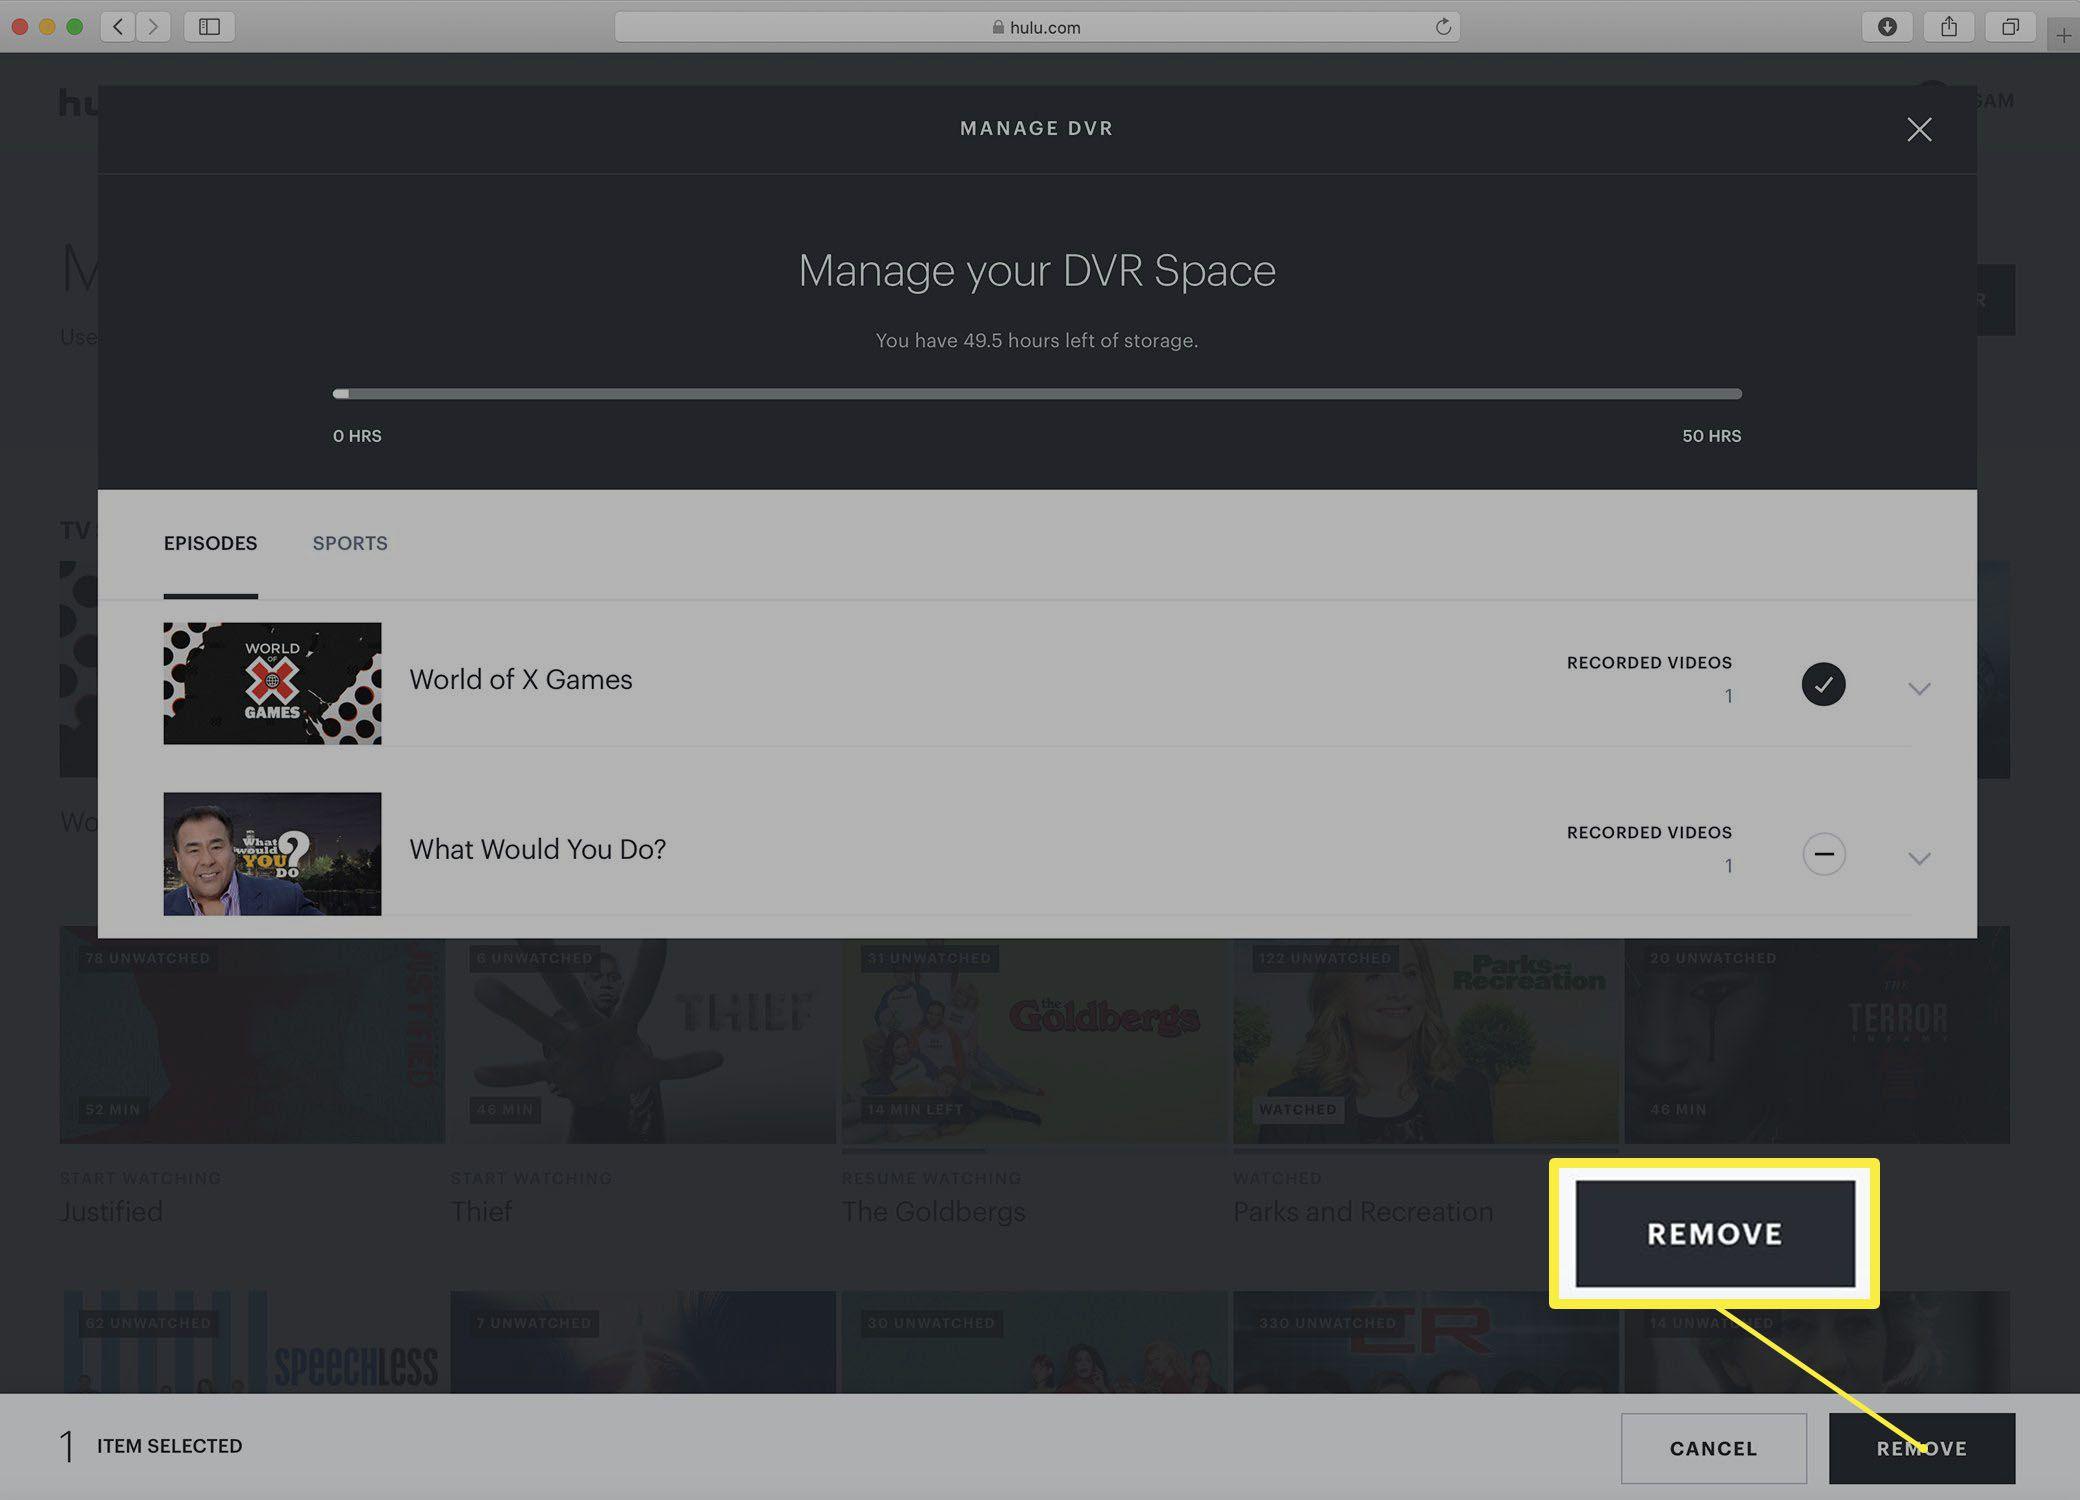 Screenshot of the Hulu Manage DVR screen.